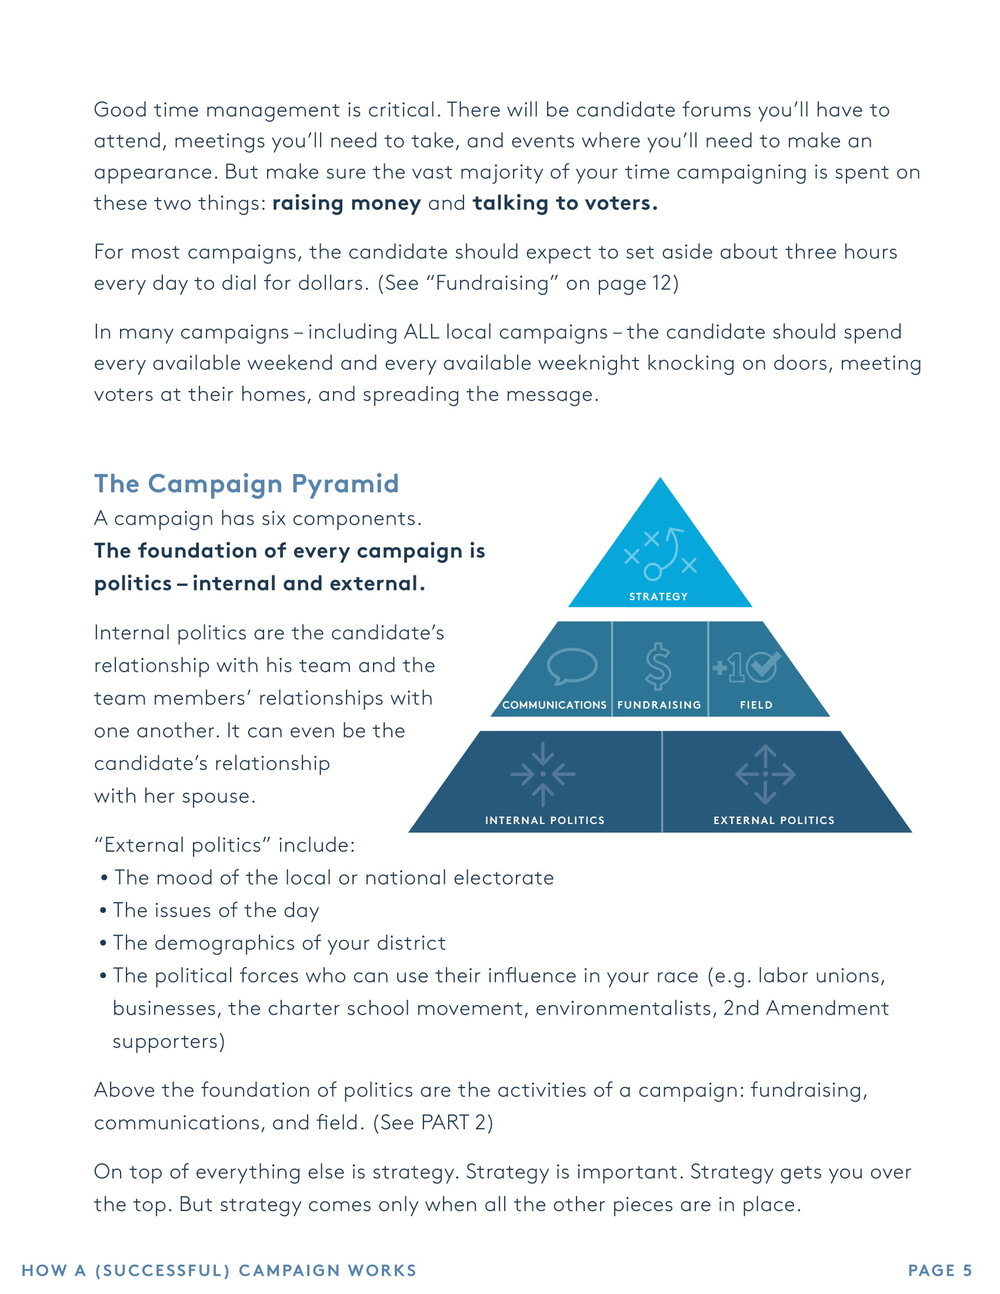 HSG_CampaignGuide_v5-05.jpg